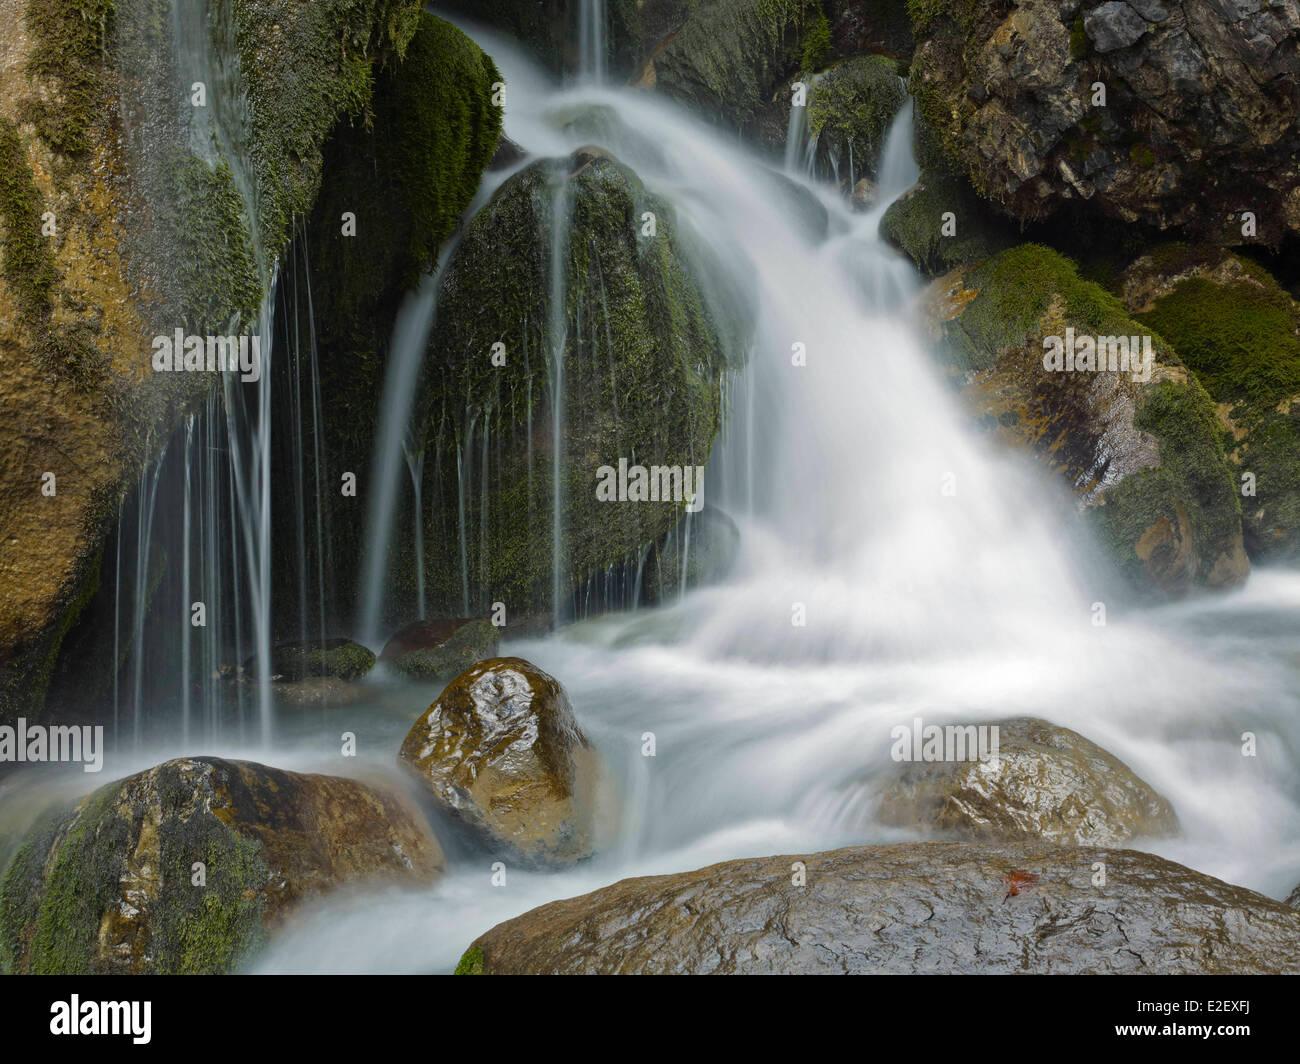 France, Haute Savoie, Chamonix, water movements, Arveyron gorges, Chamonix valley - Stock Image